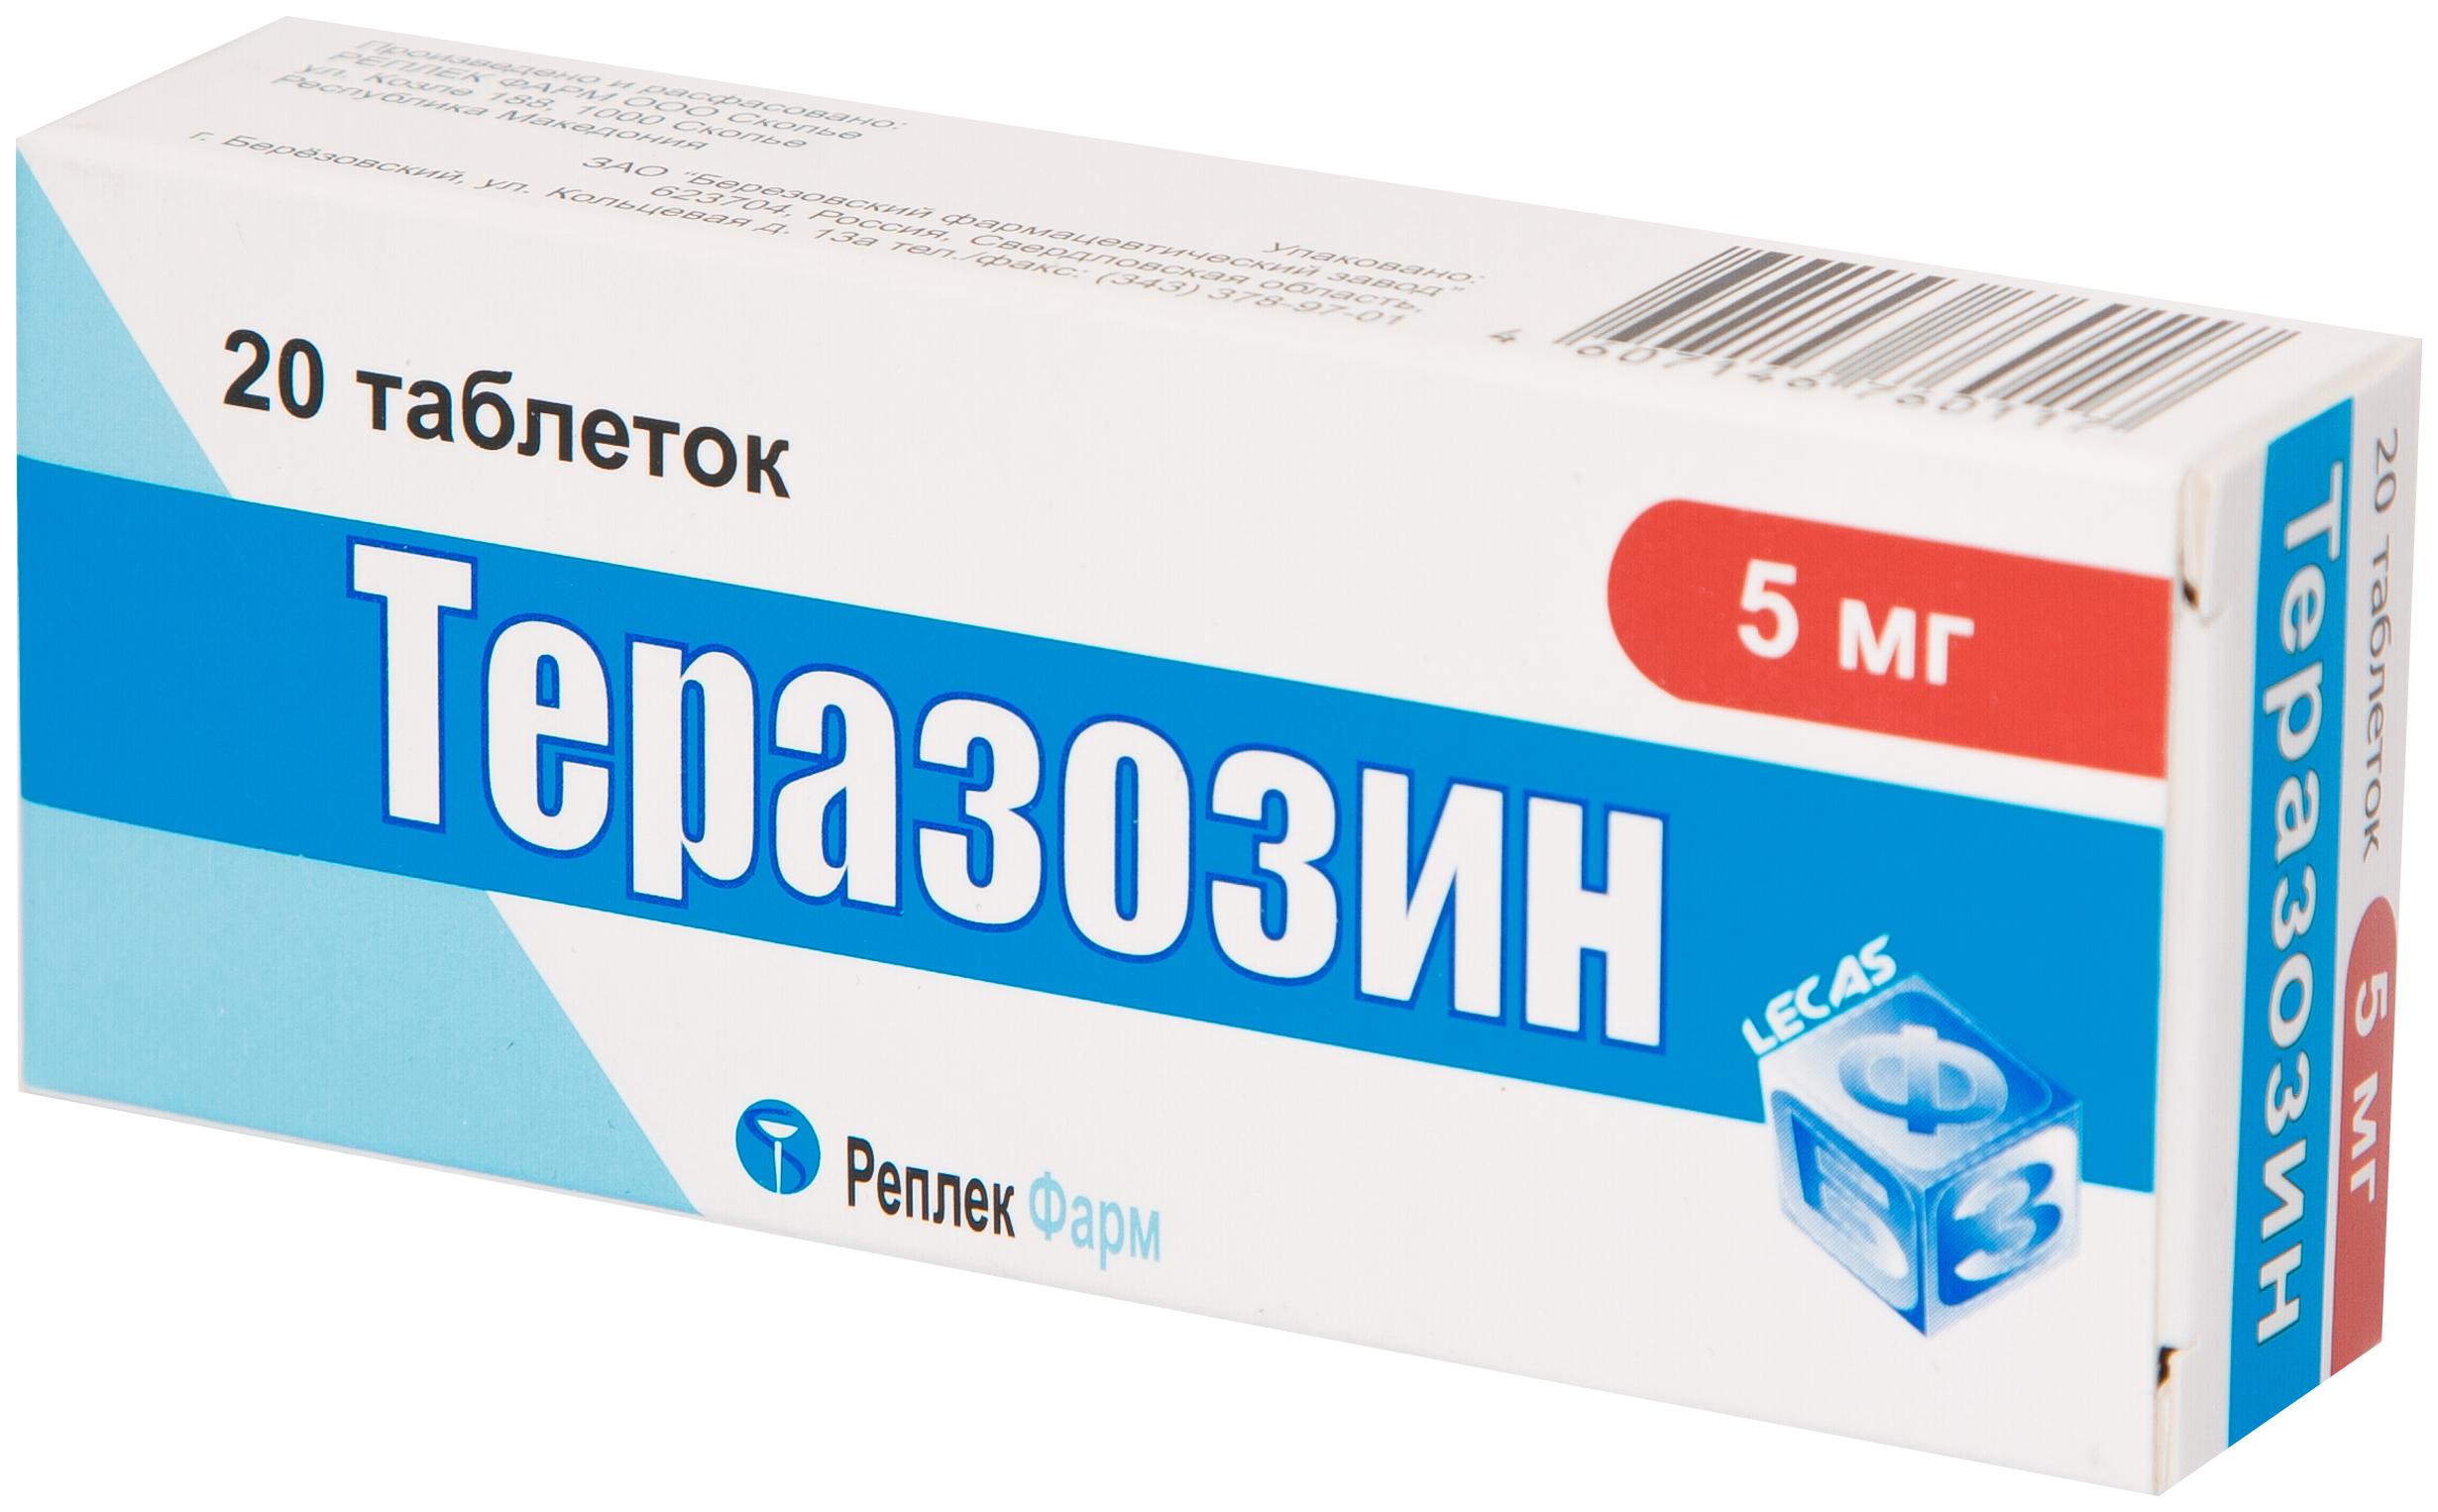 ТЕРАЗОЗИН таблетки 5 мг 20 шт.